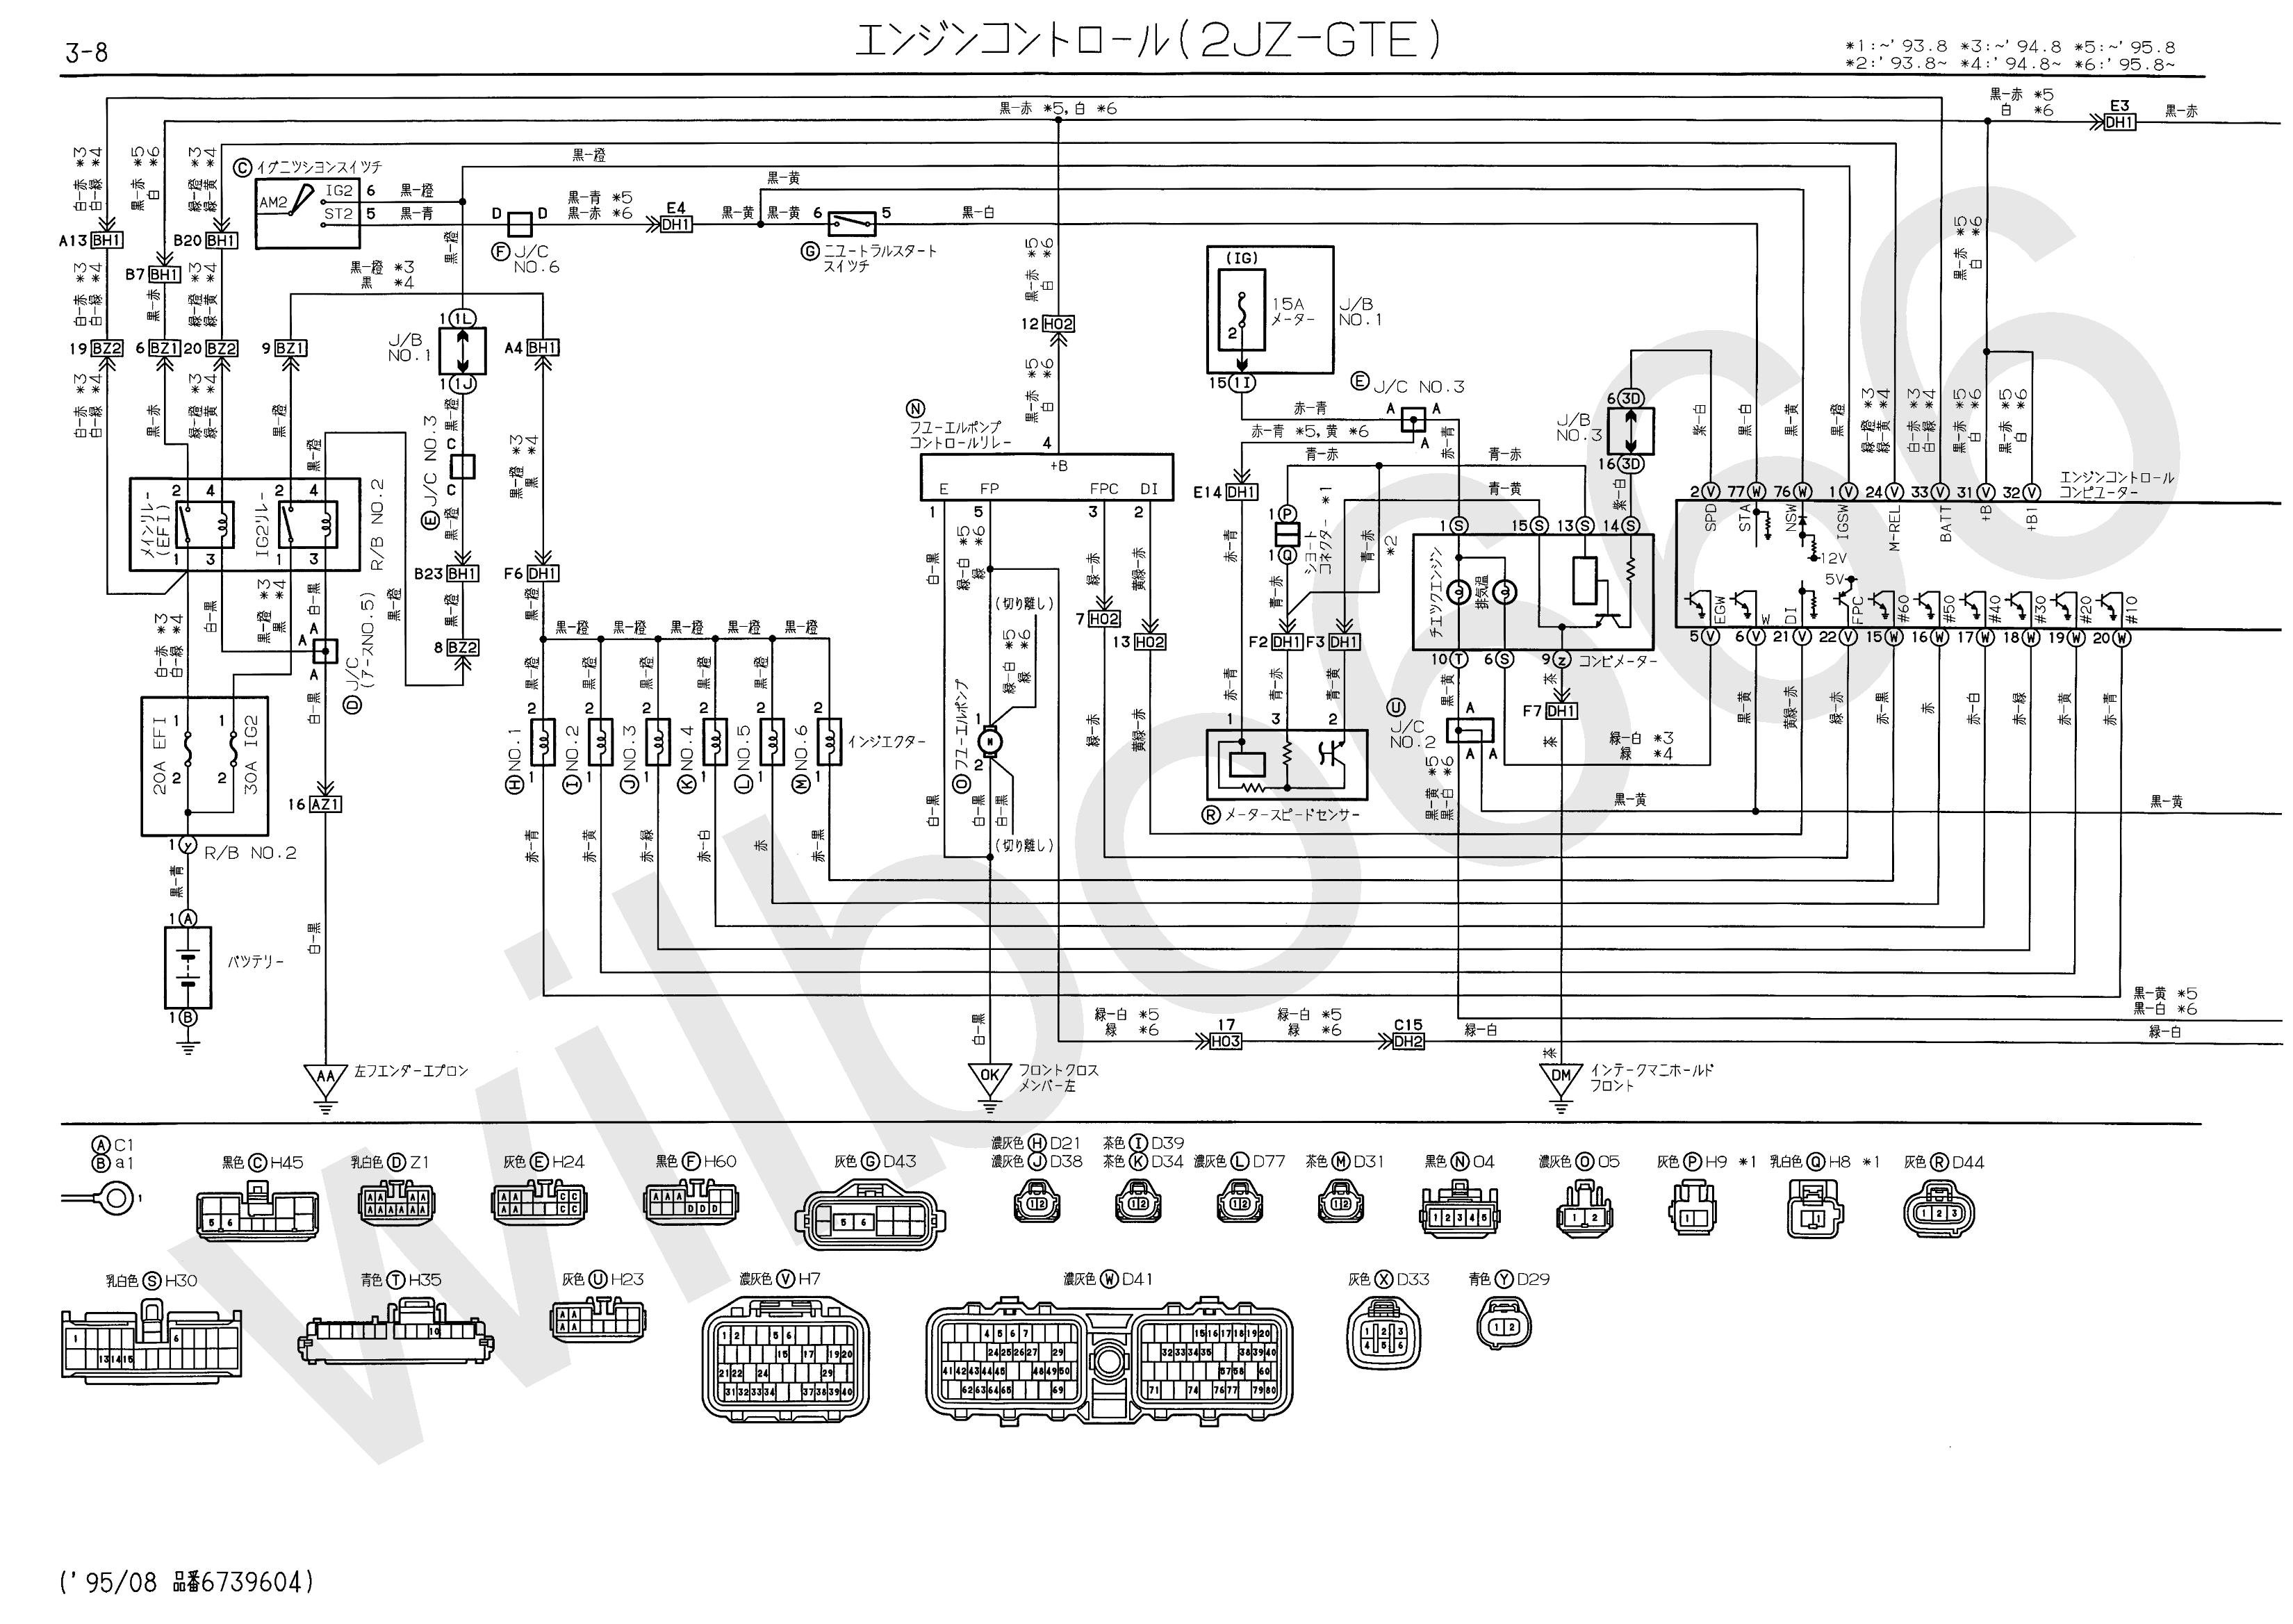 Swell 2001 Honda Civic Ecu Wiring Diagram Basic Electronics Wiring Diagram Wiring Cloud Picalendutblikvittorg